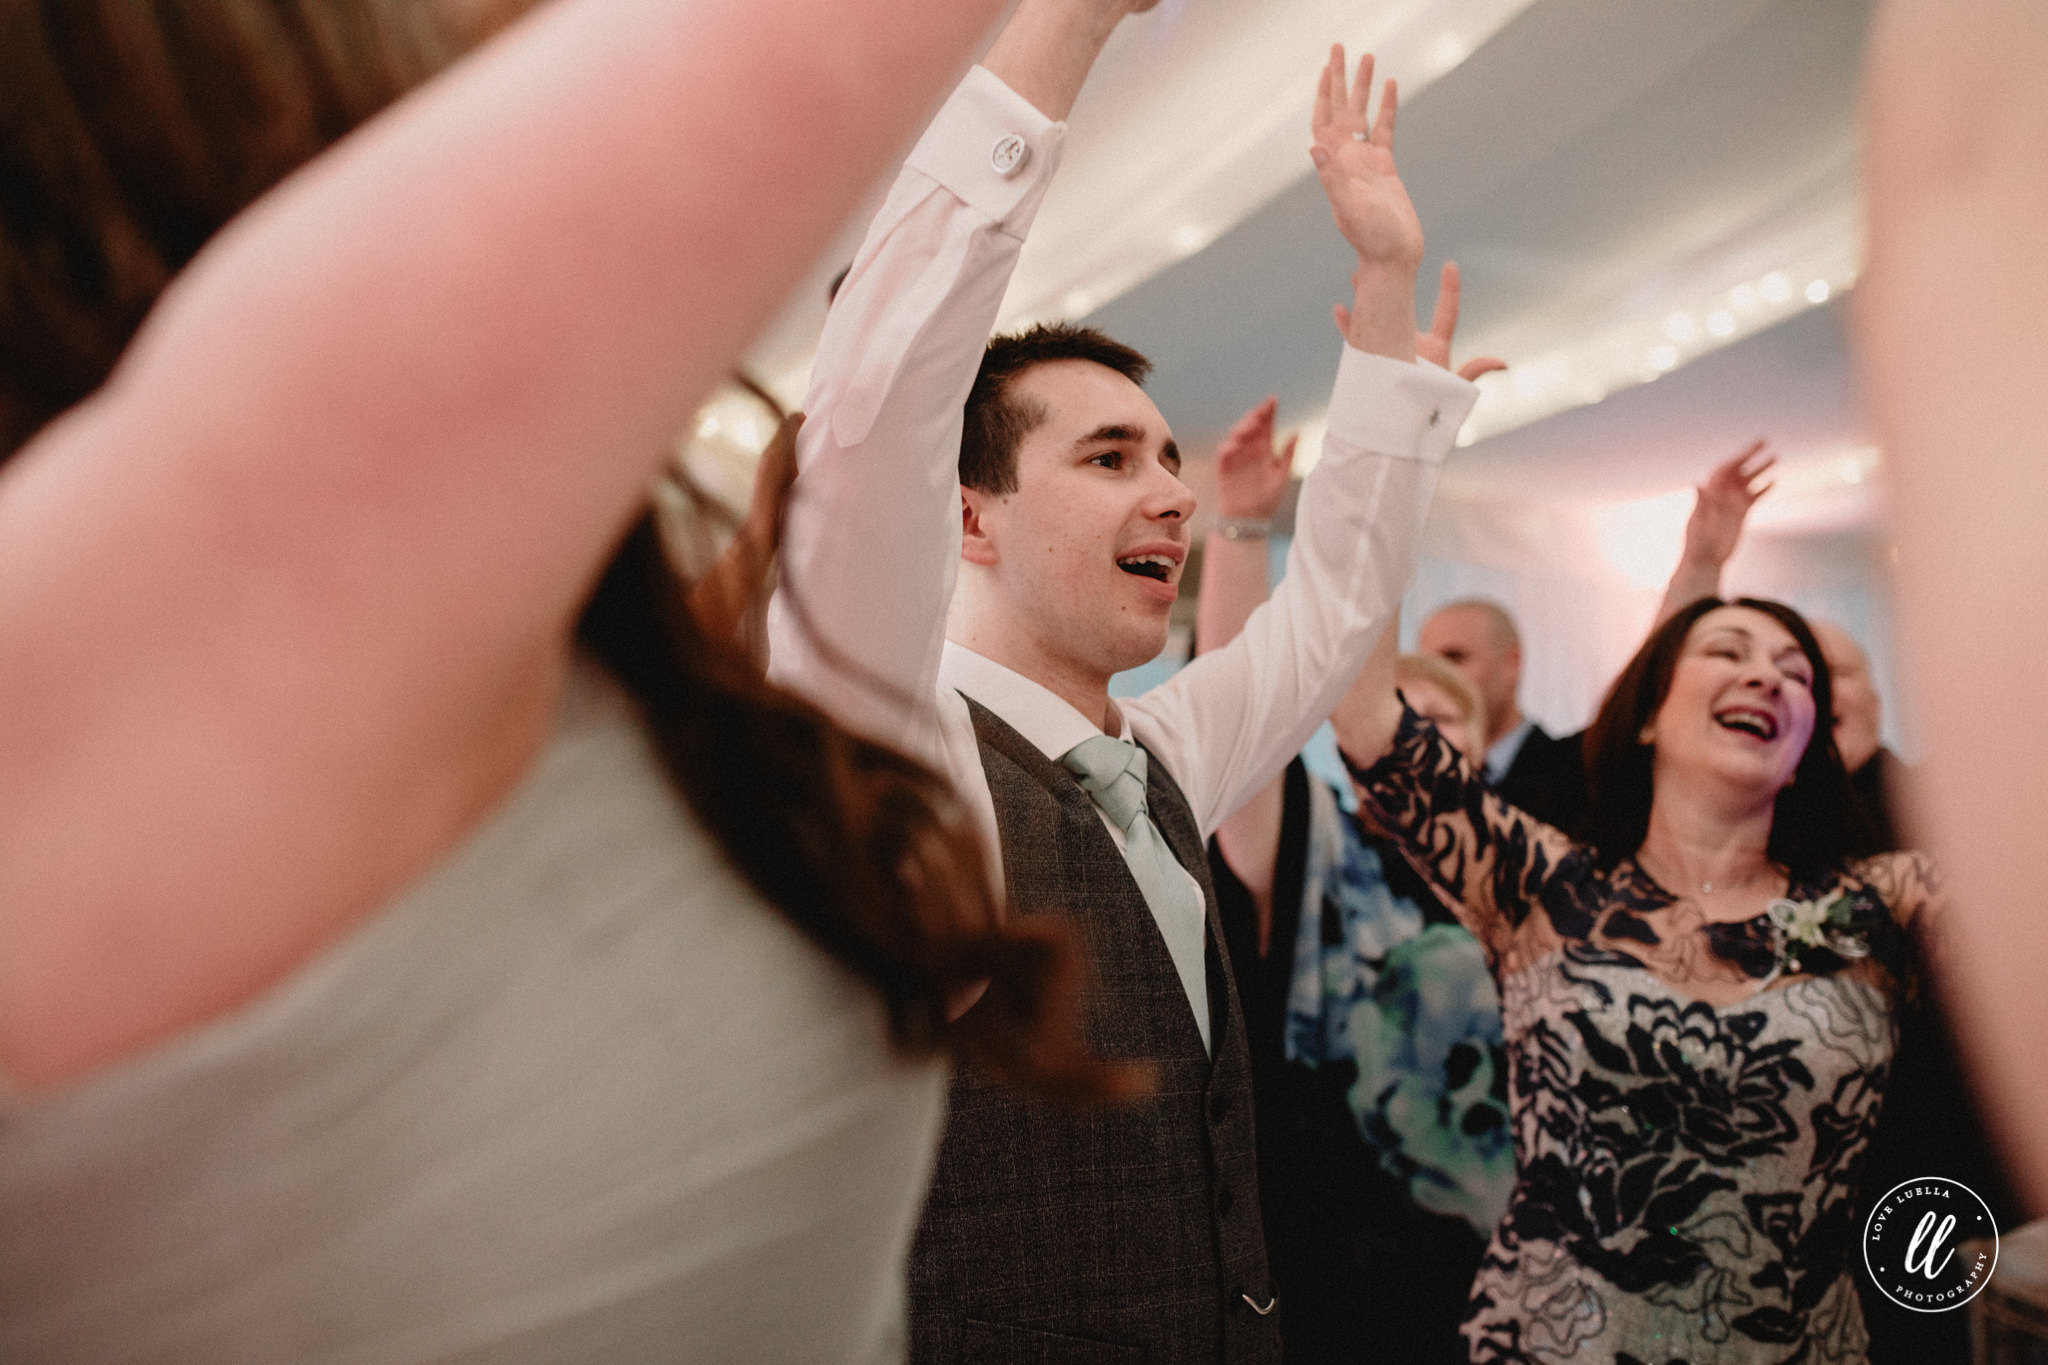 Celtic Manor Resort Wedding Photographer (43 of 47).jpg